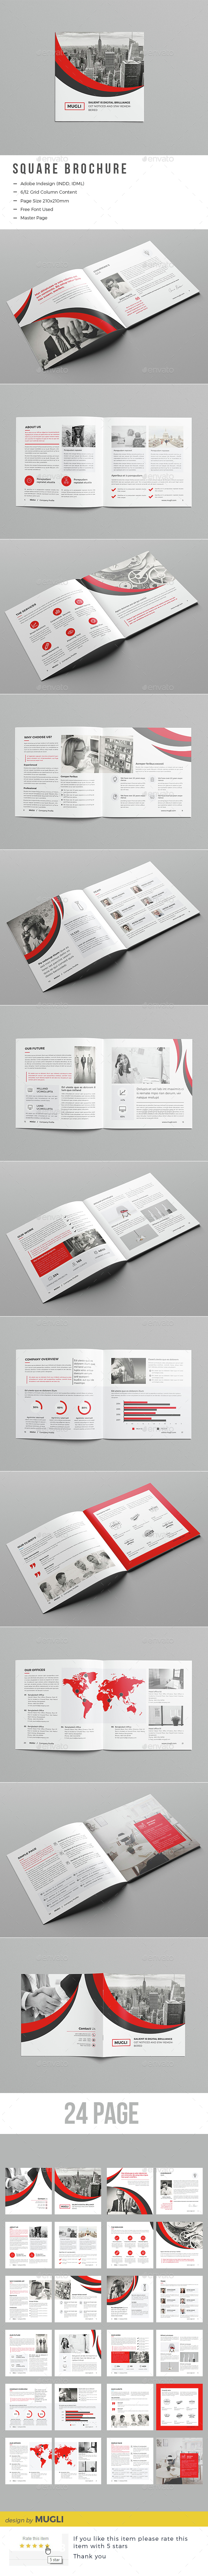 Square Business Brochure - Corporate Brochures